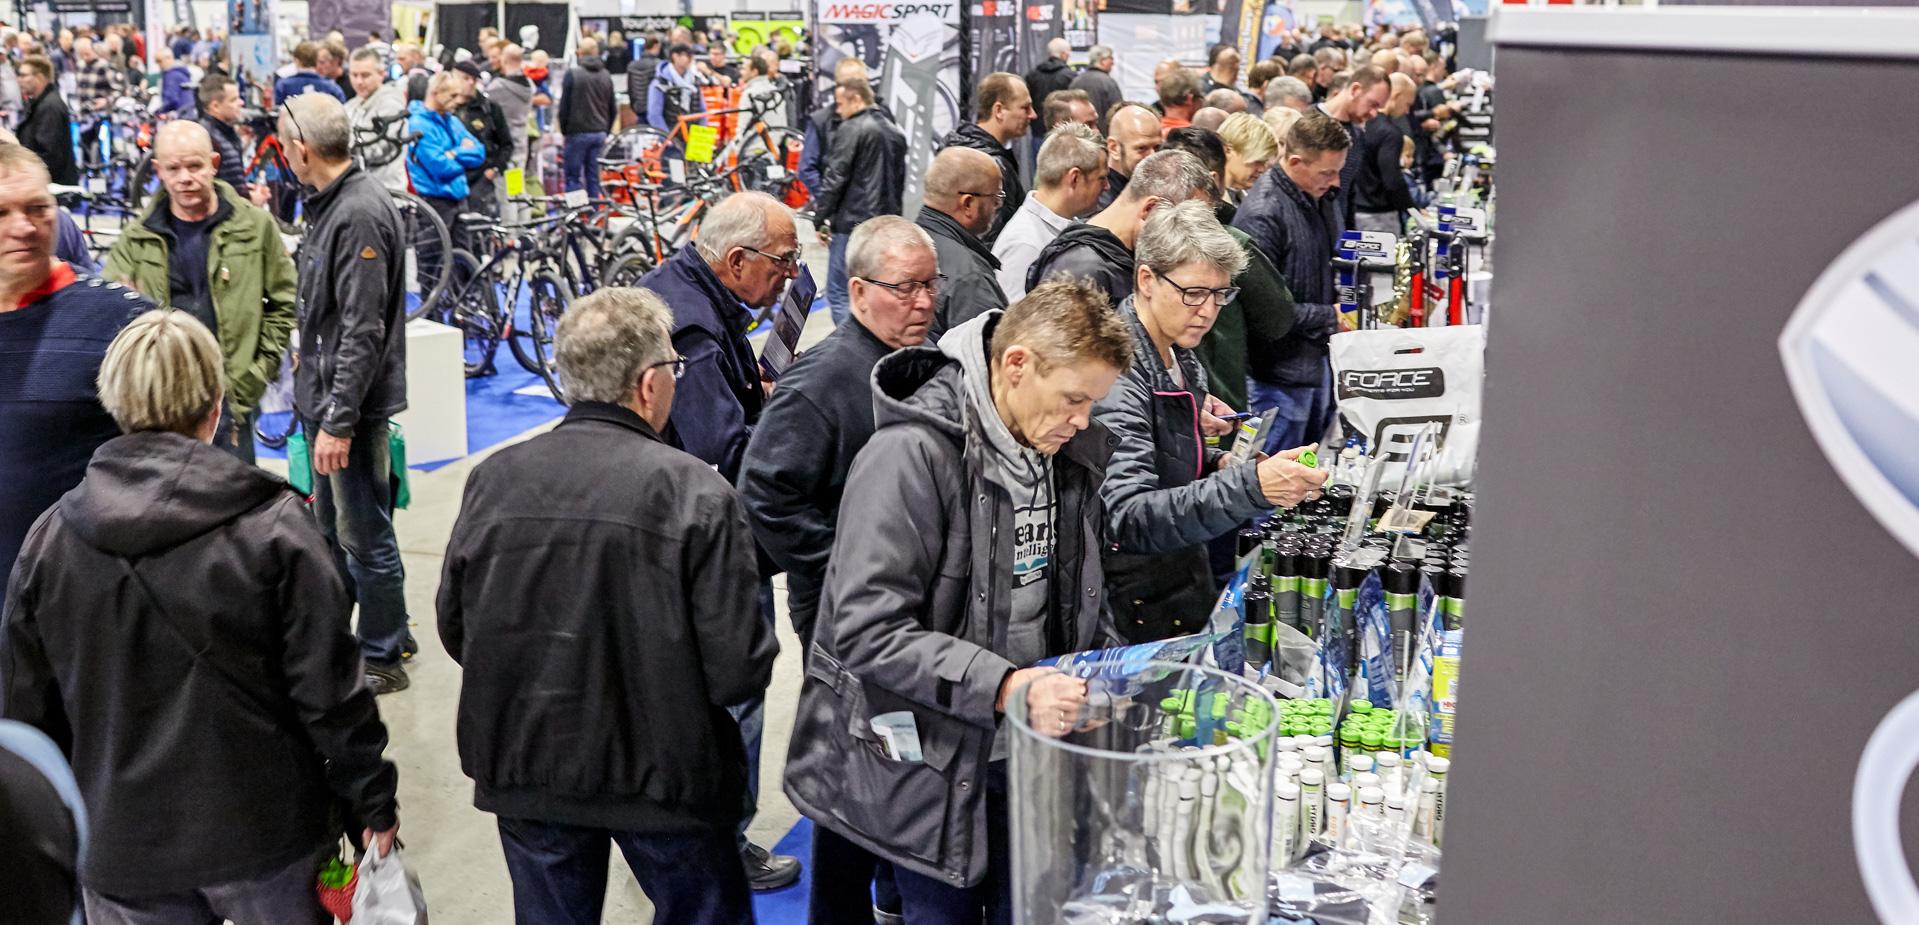 Nu begynder cykelsæsonen 2020: CykelSportMessen kommer igen til Aarhus